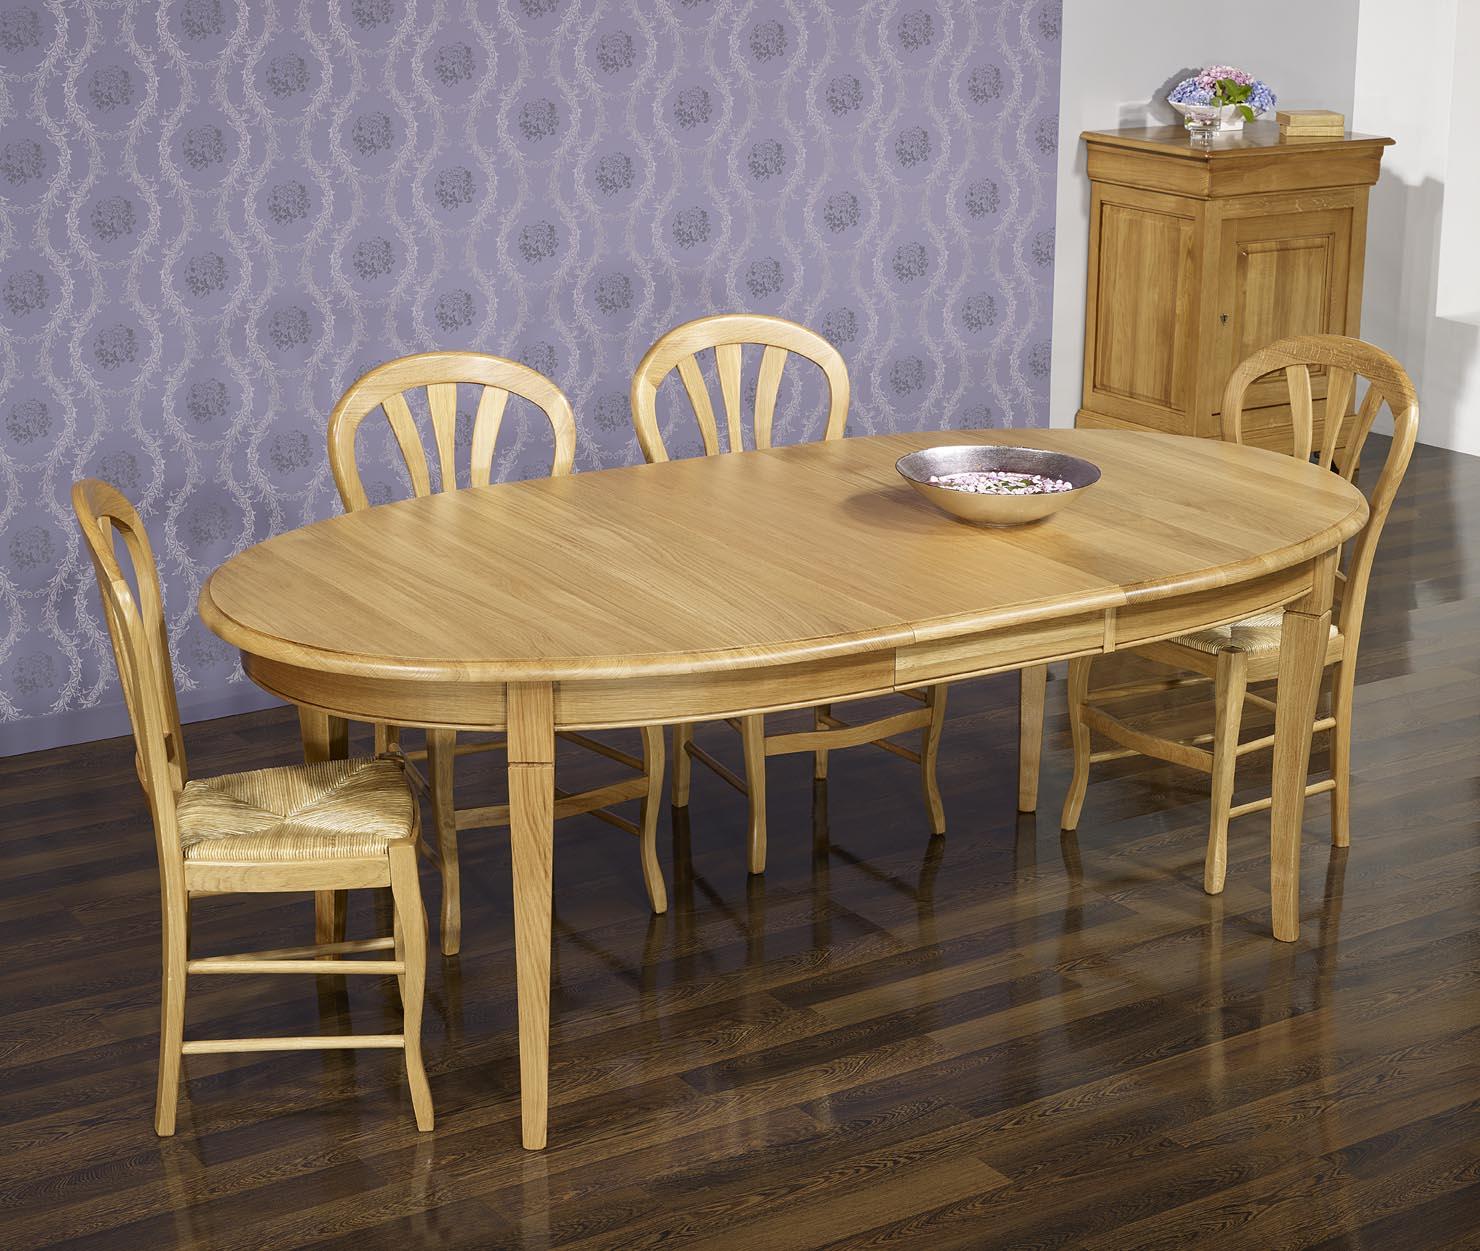 table ovale en ch ne massif de style louis philippe finition ch ne dor 160x120 meuble en. Black Bedroom Furniture Sets. Home Design Ideas